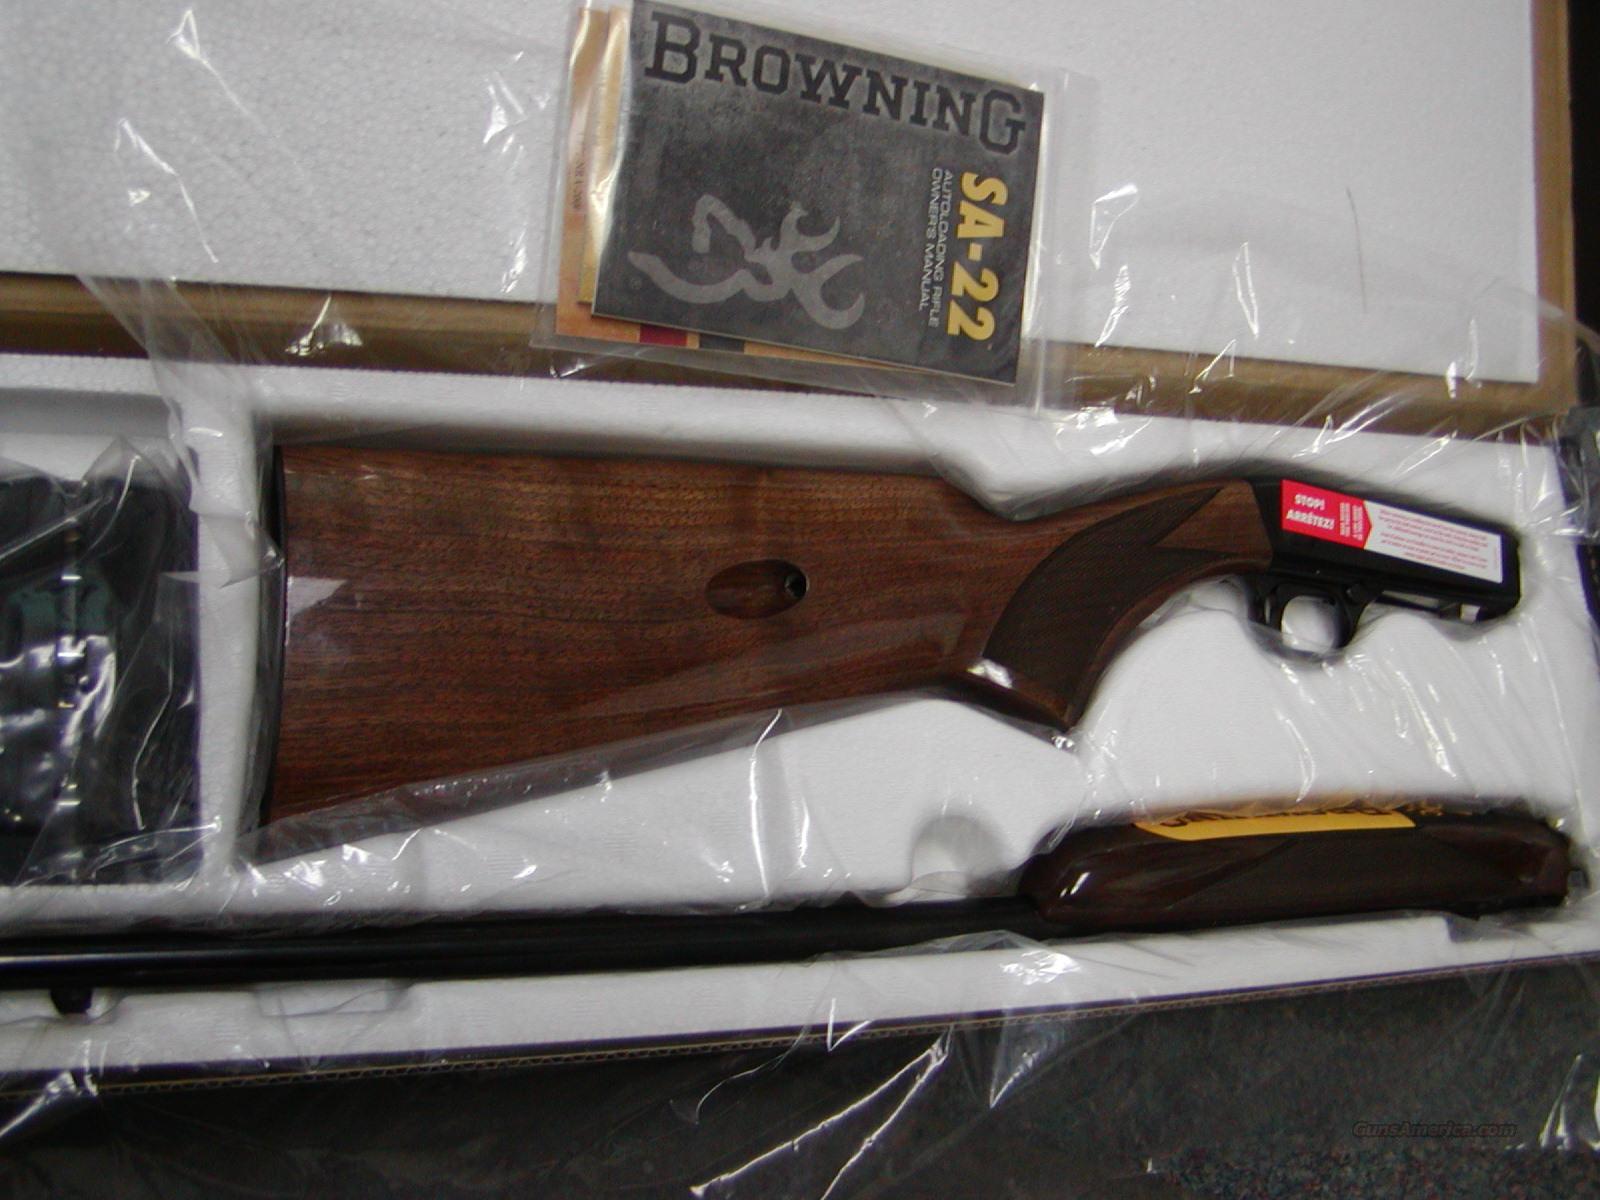 Browning semi auto 22 short only guns gt rifles gt browning rifles